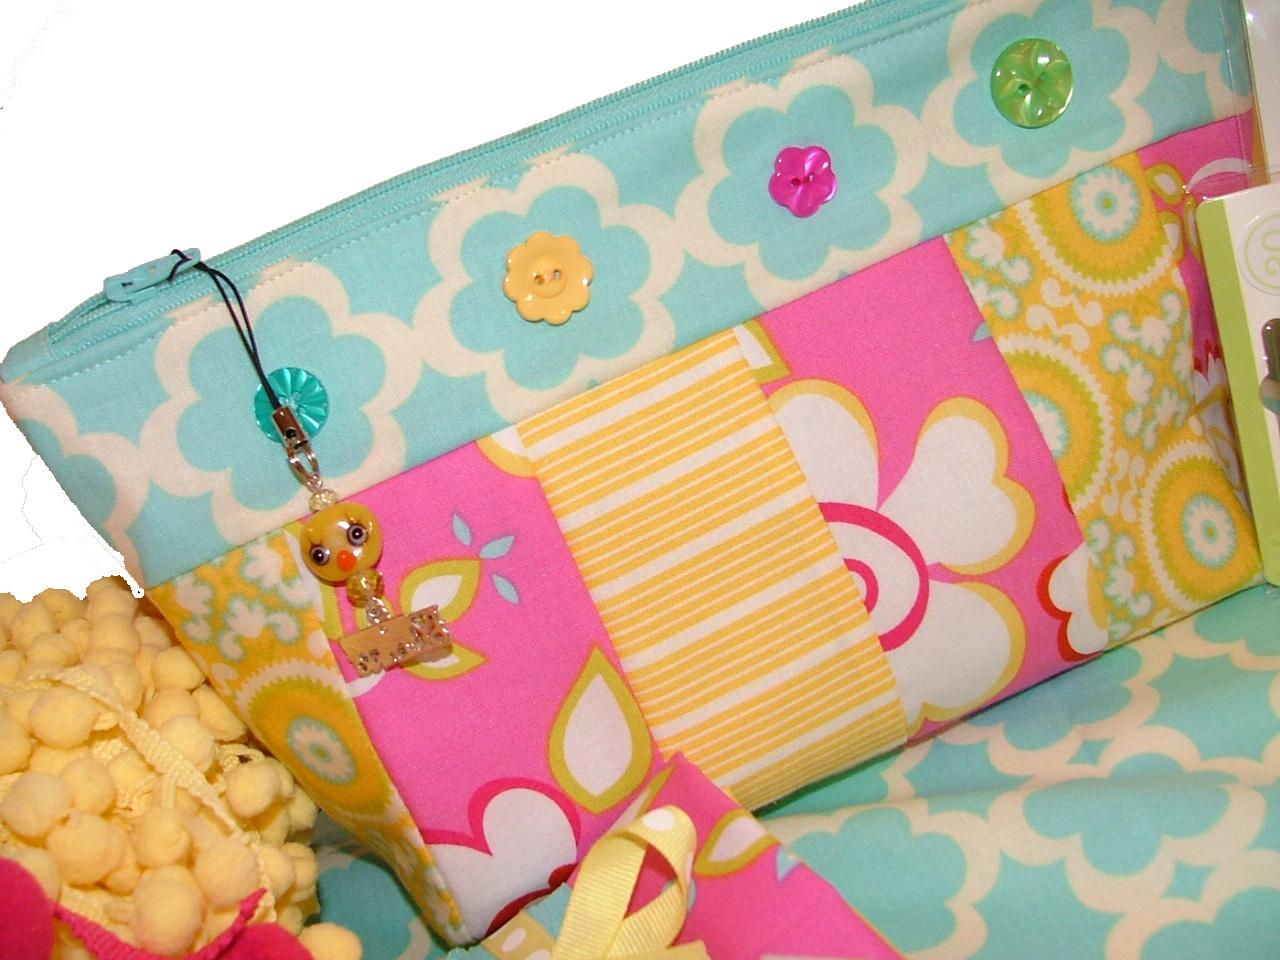 pic new posts: Wallpaper Zippy